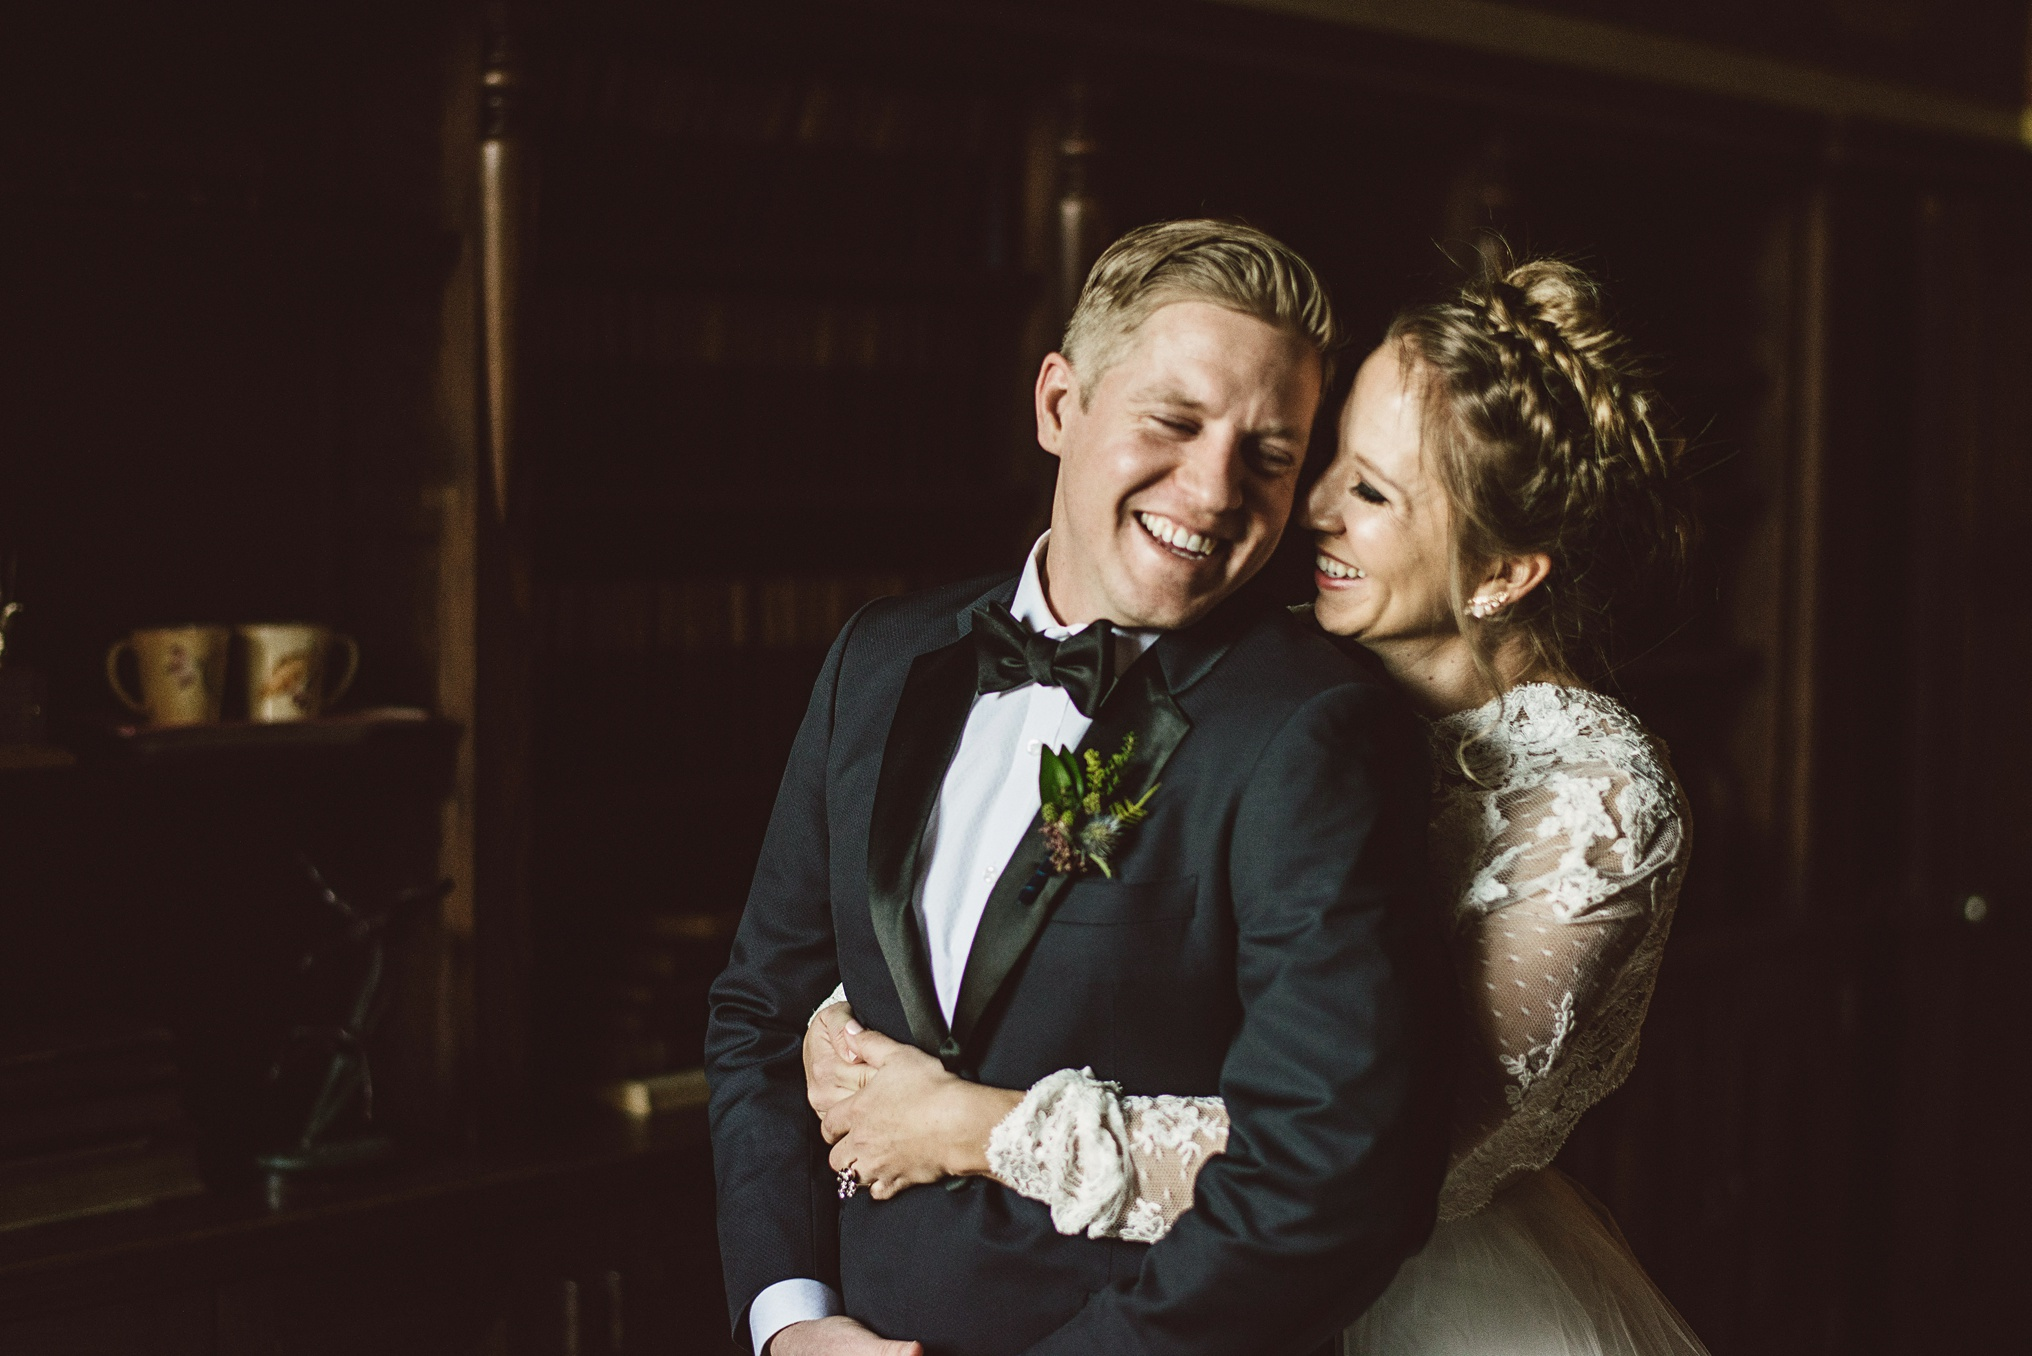 best_wedding_photography_2017_by_lucas_botz_photography_228.jpg